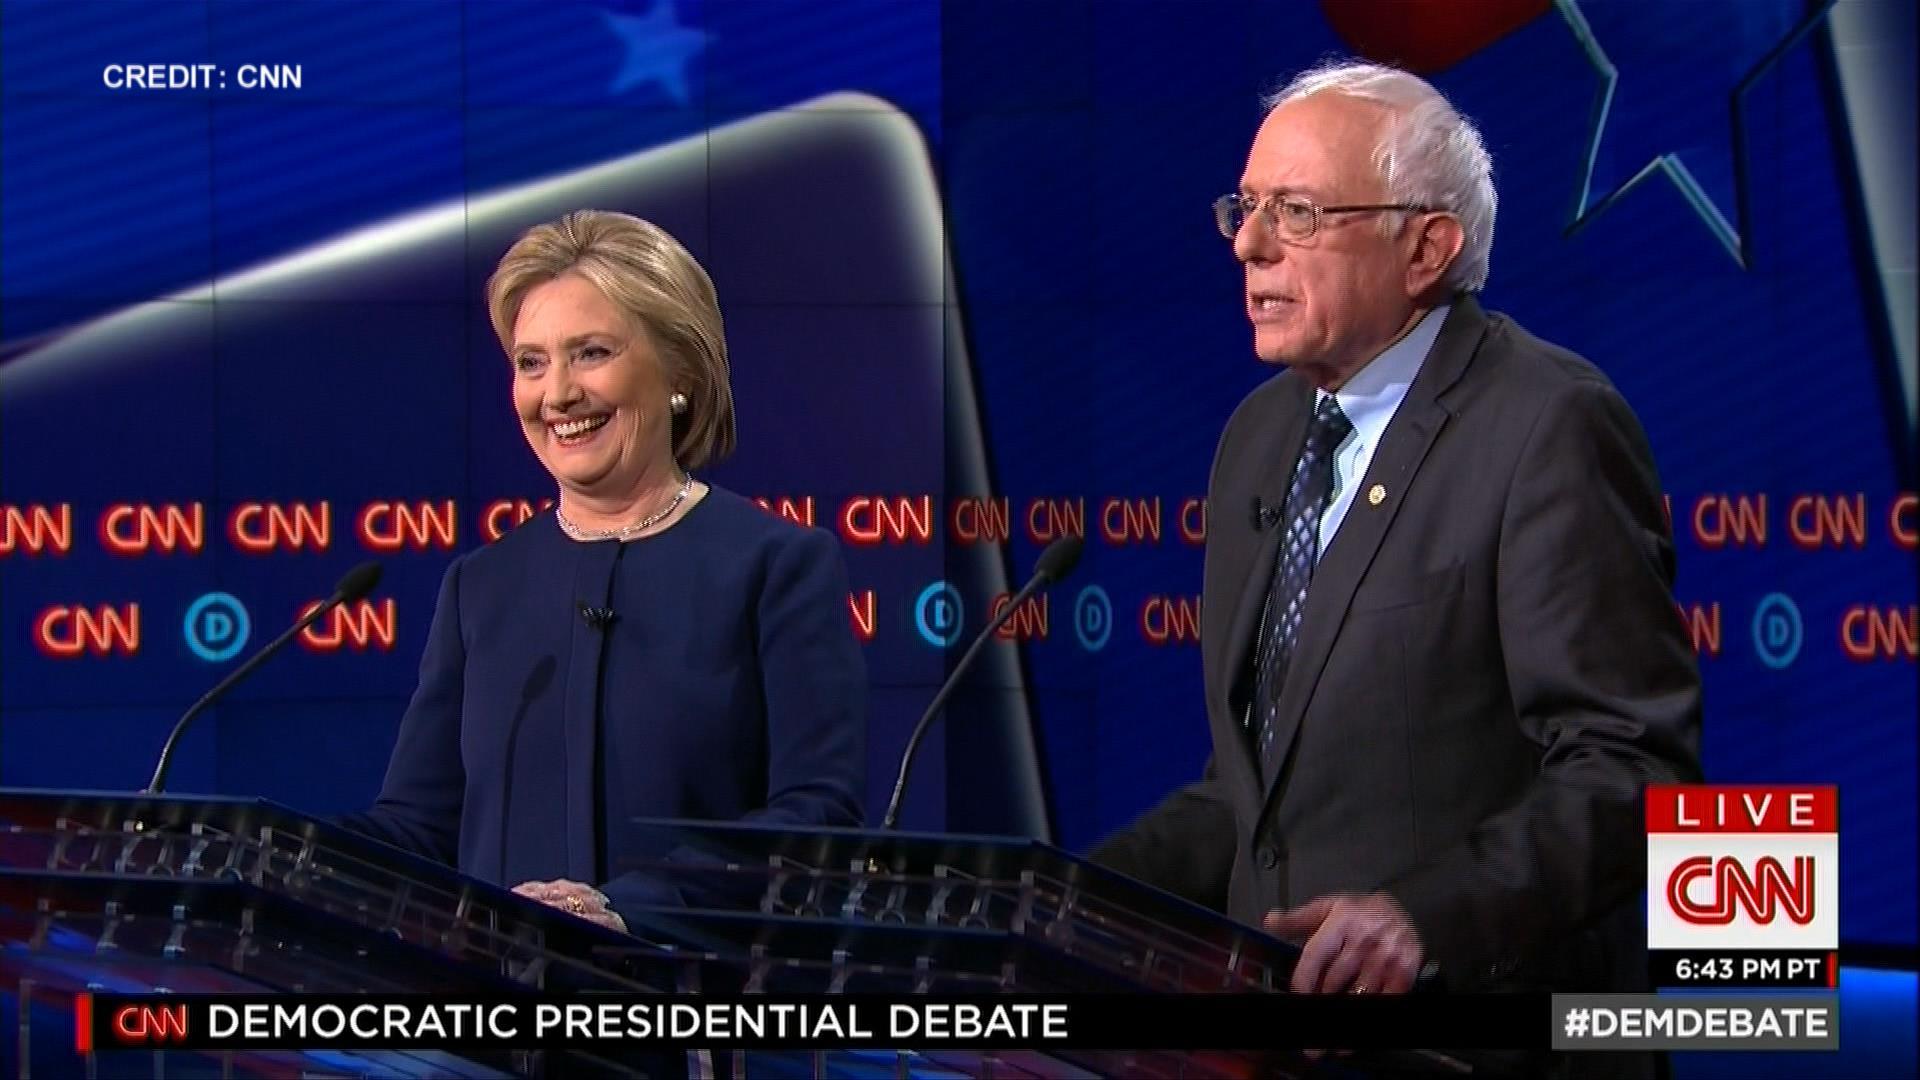 Sanders pokes fun at GOP debates